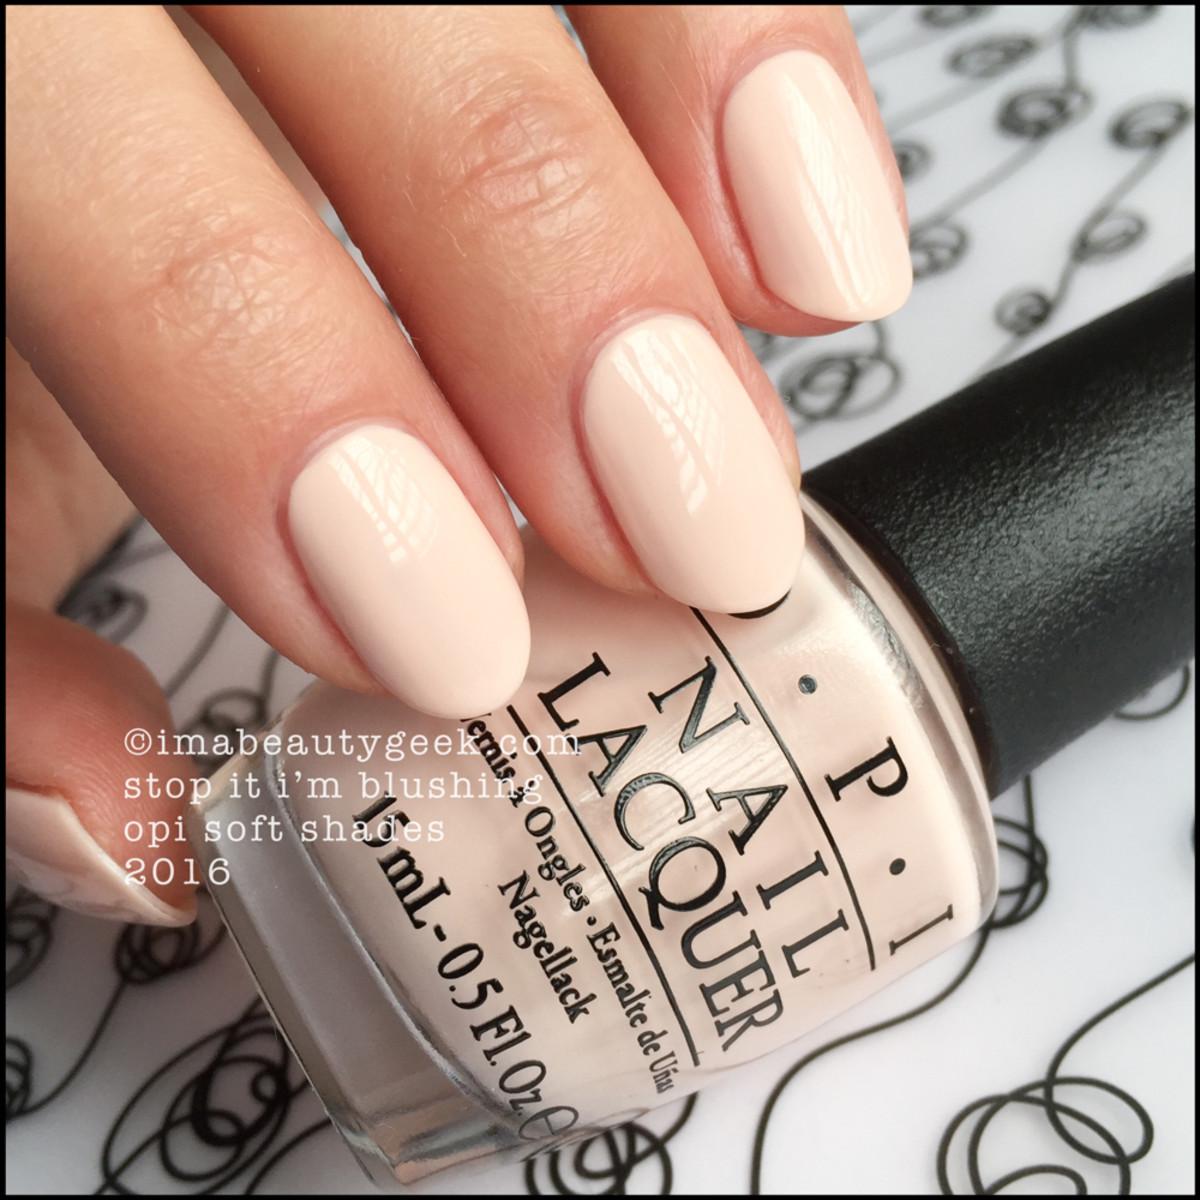 OPI Stop It Im Blushing_OPI Soft Shades 2016 Pastels Swatches